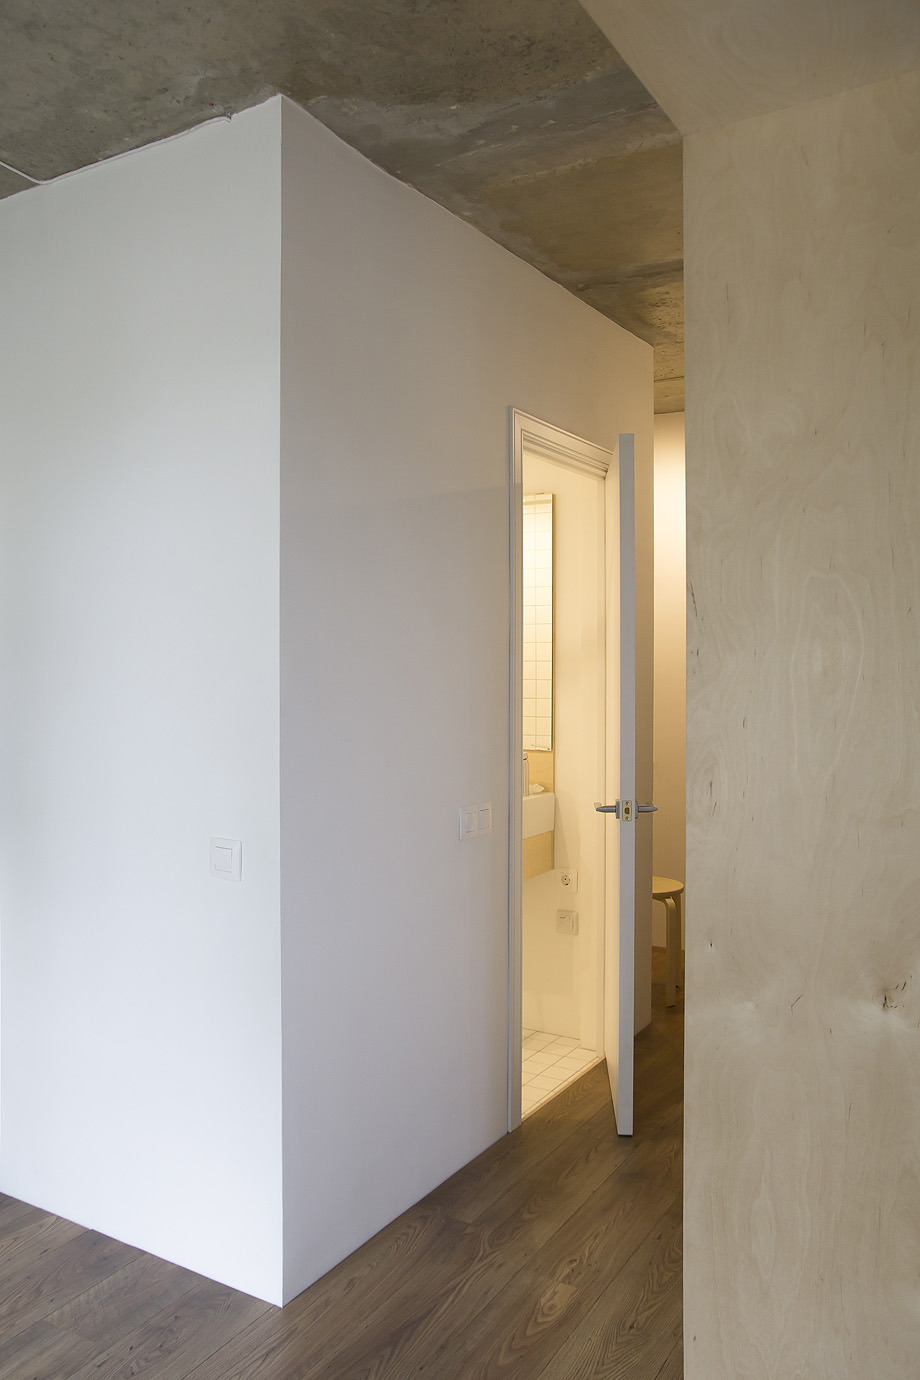 apartamento en rusia por kdva architects - foto daria koloskova (19)